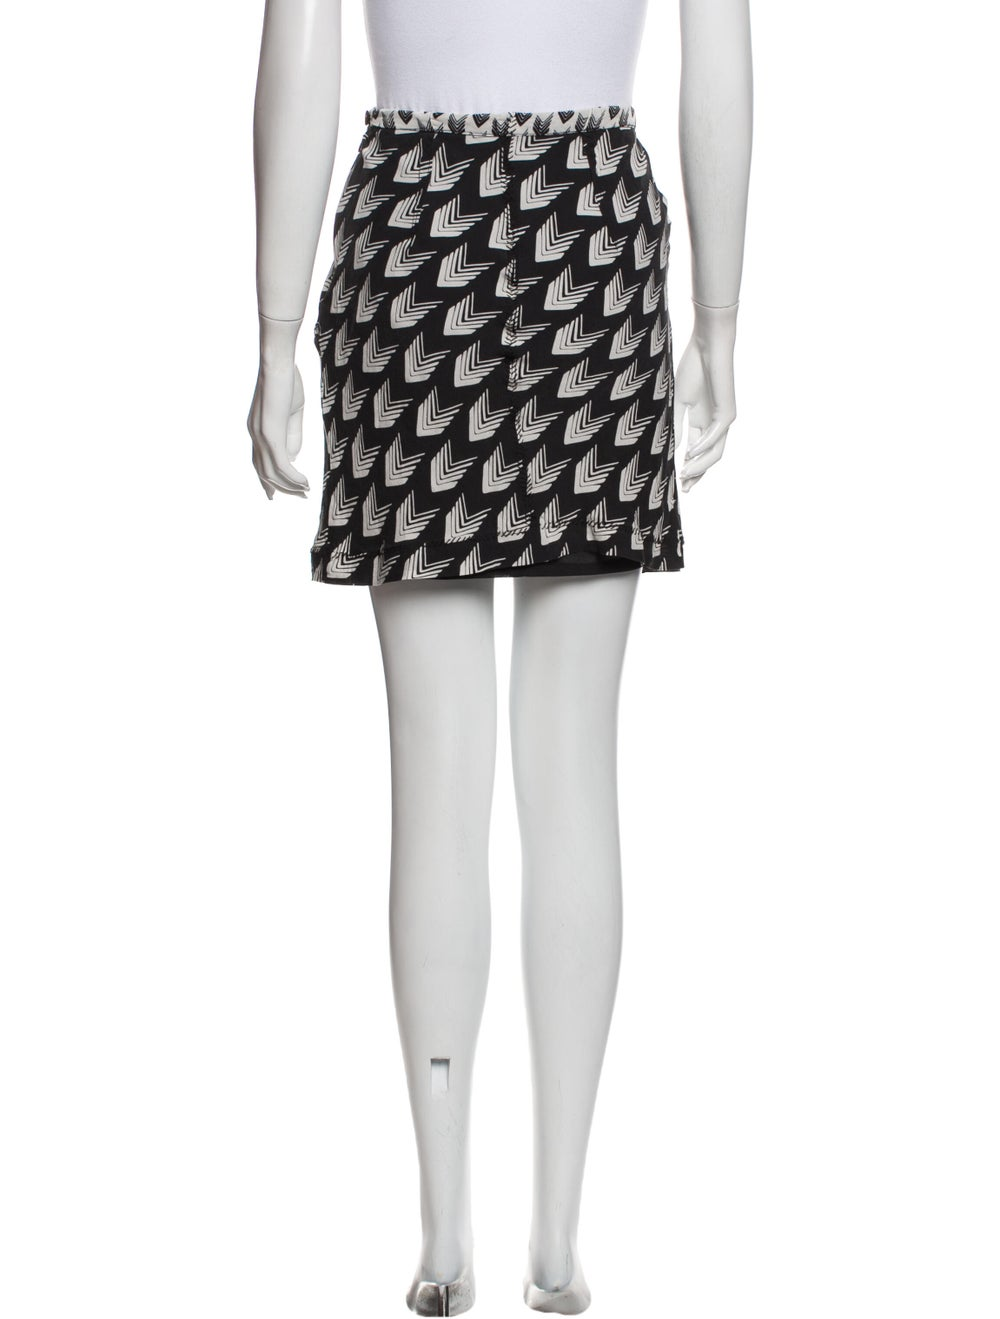 Rag & Bone Silk Mini Skirt Black - image 3